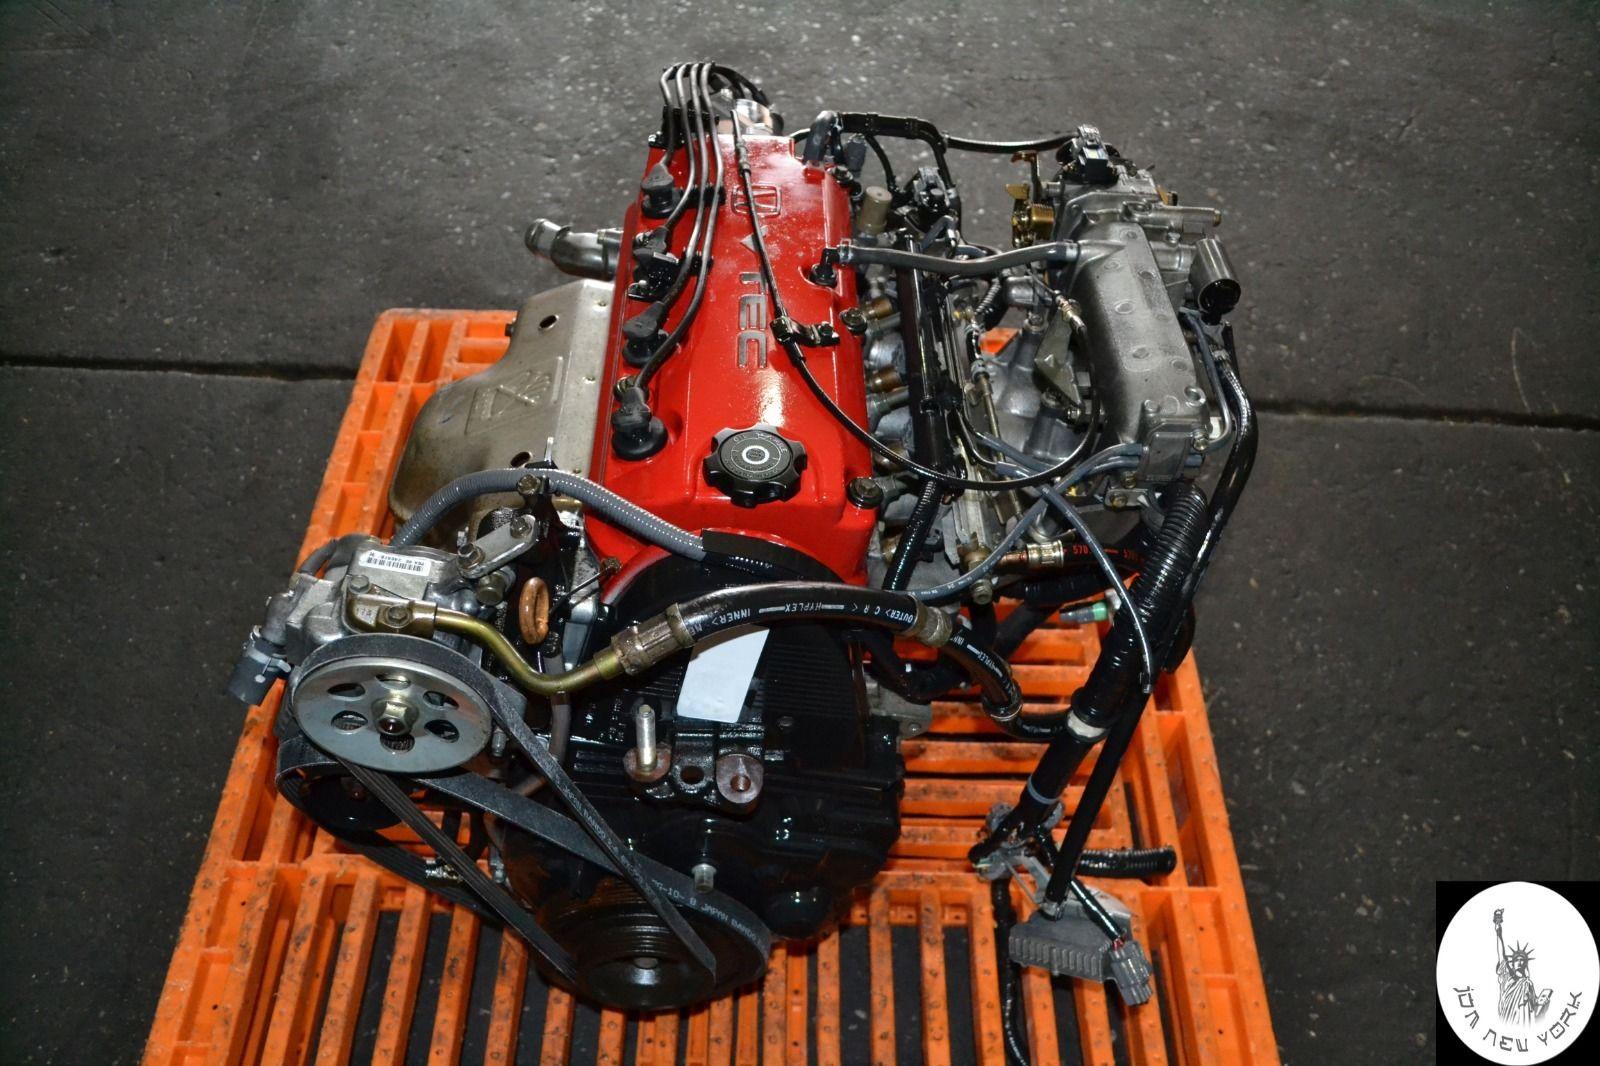 94 95 96 97 HONDA ACCORD EX 2.2L 4-CYLINDER SOHC VTEC ENGINE JDM F22B - JDM New York